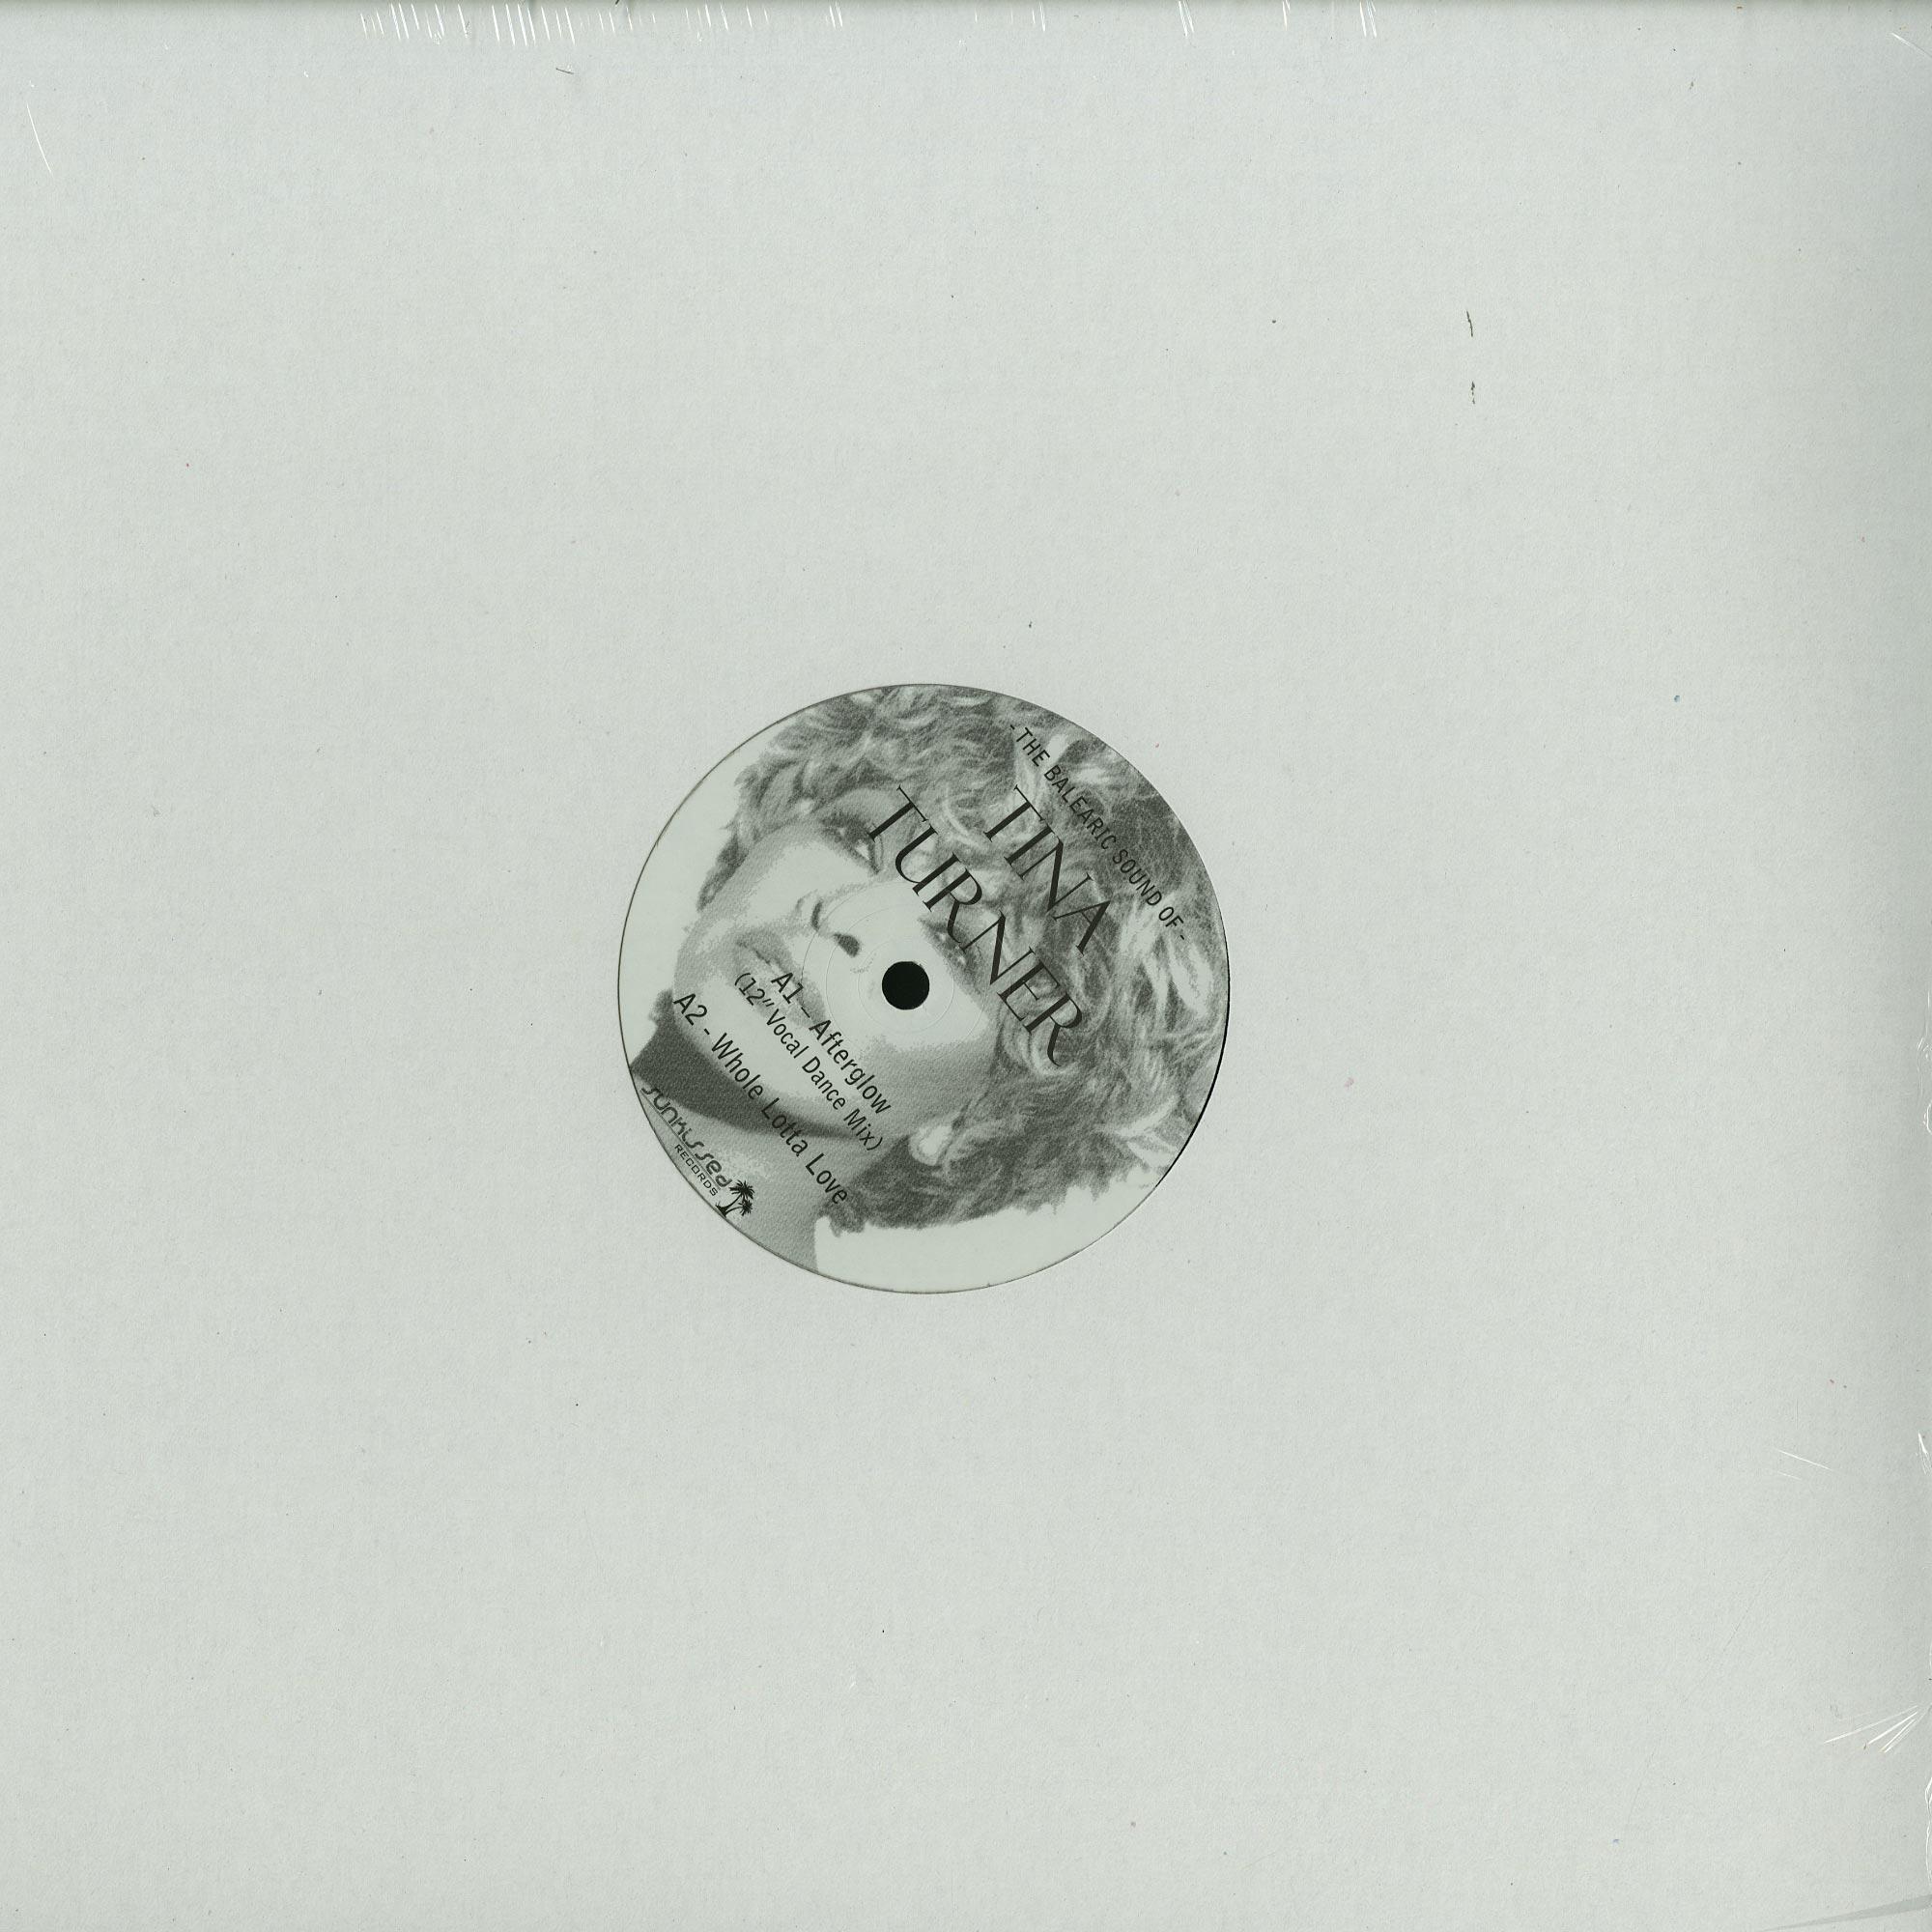 Tina Turner - THE BALEARIC SOUND OF TINA TURNER